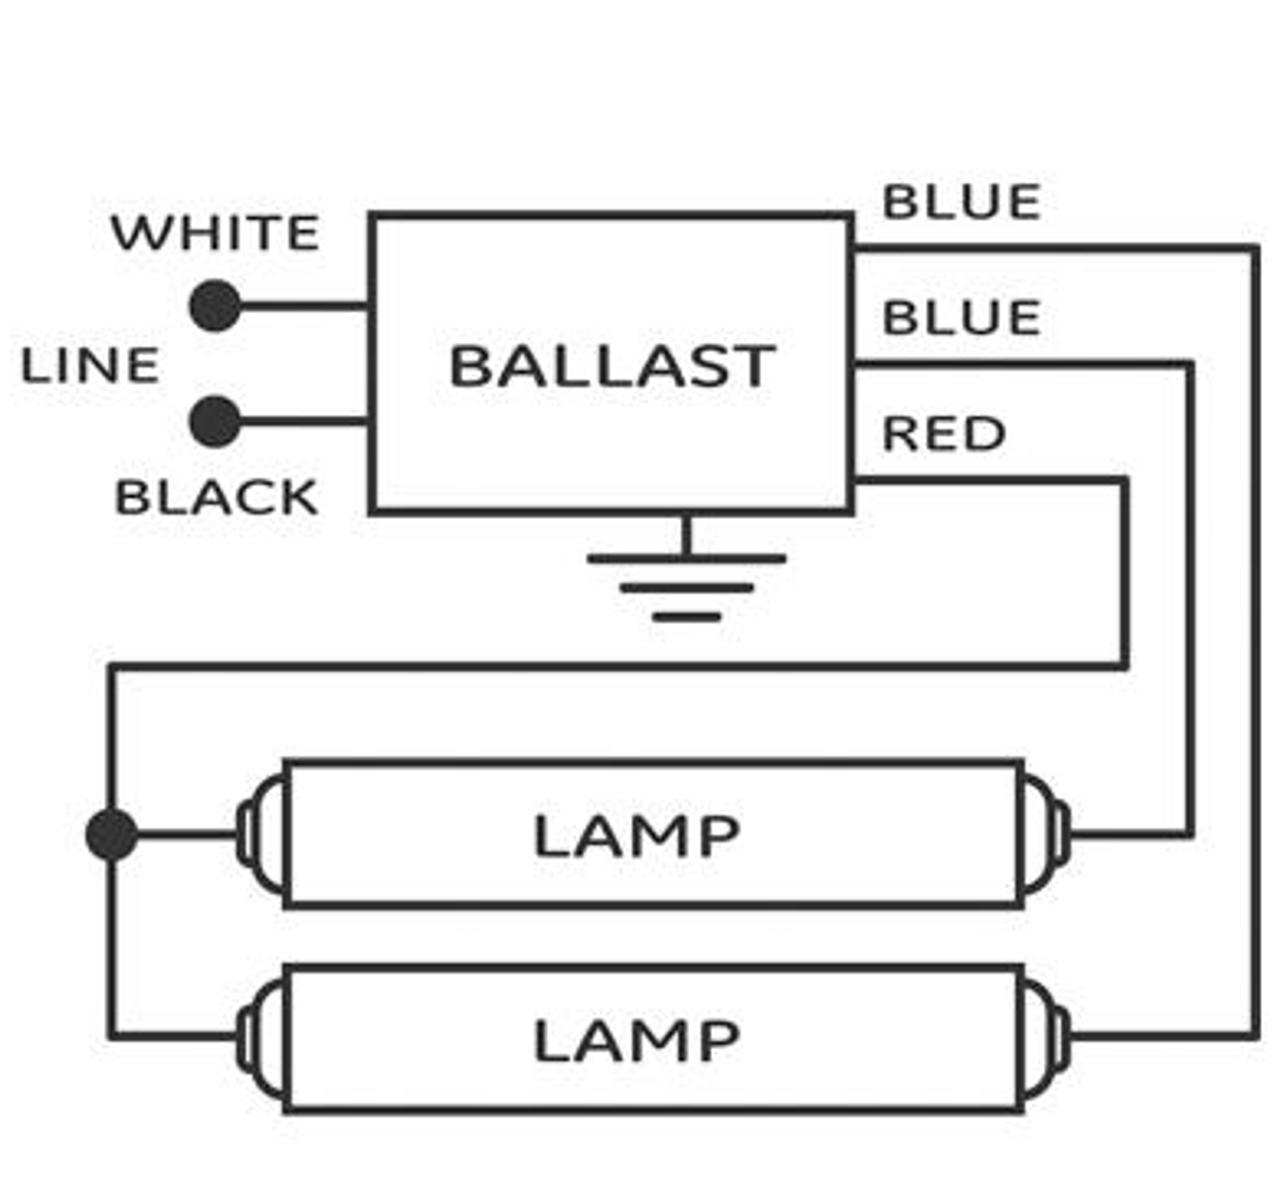 ge260is mv n (74474) ge multi volt proline™ ballastge260is mv n ballast